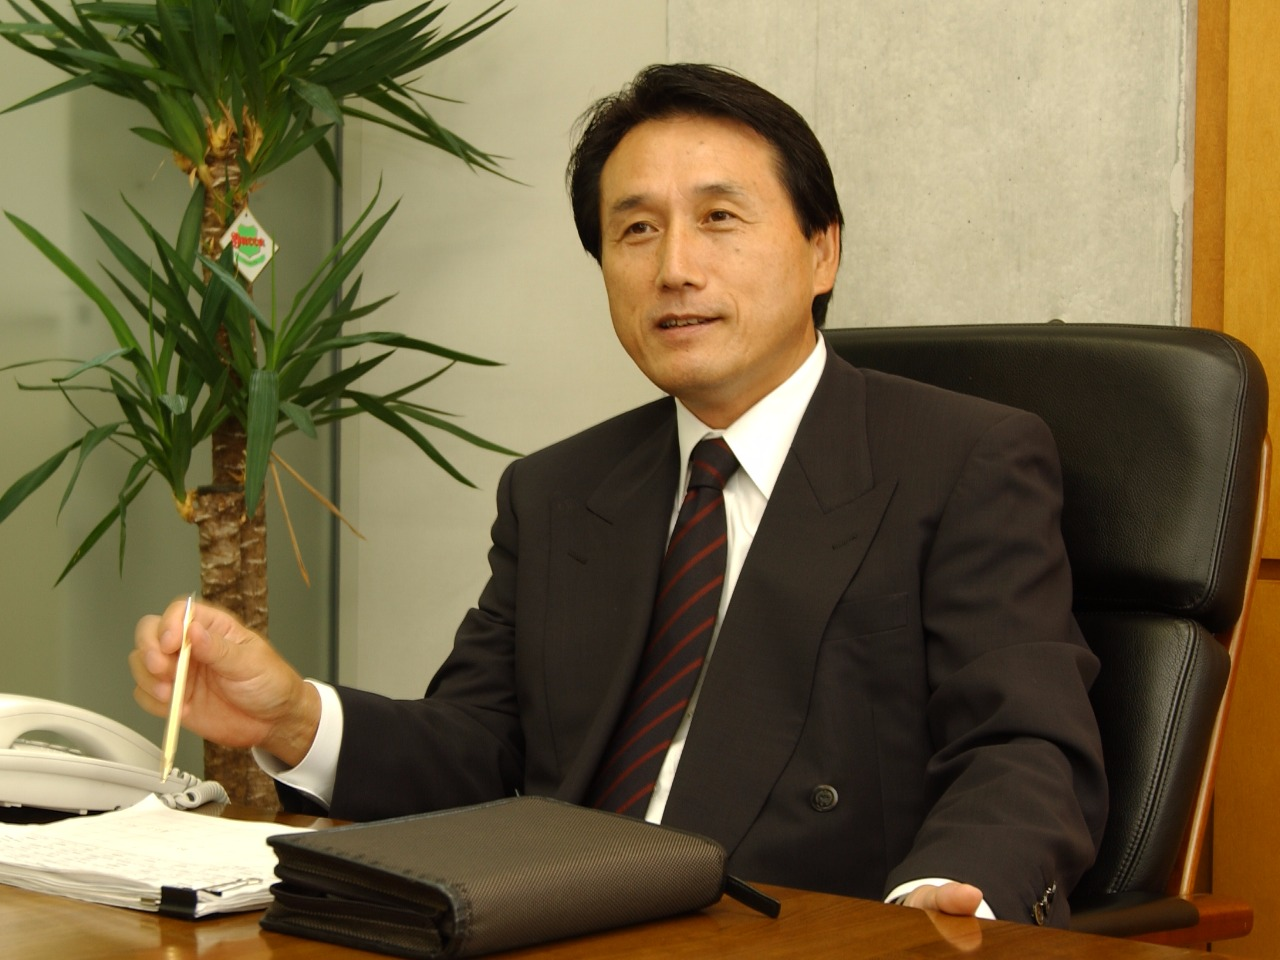 株式会社81プロデュース 代表取締役社長 南沢道義